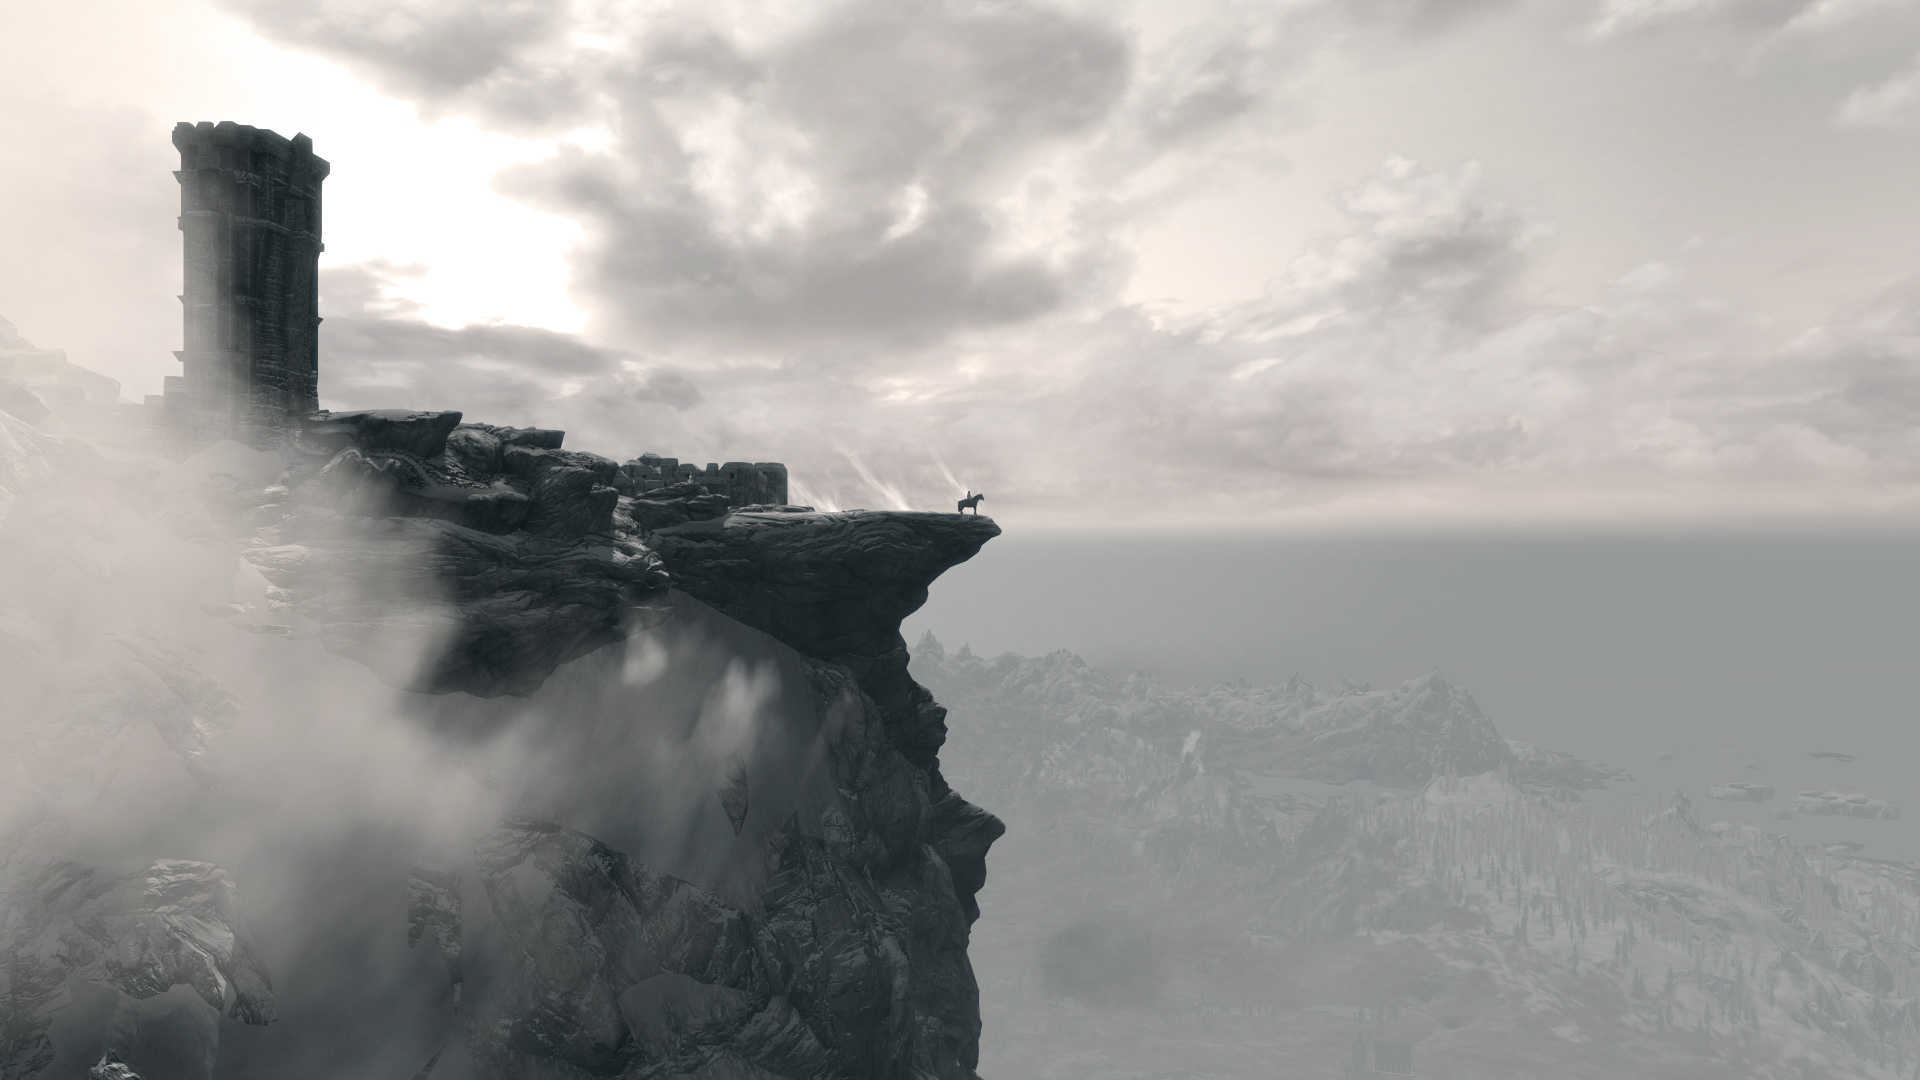 Wallpaper The Elder Scrolls Heroes Of Skyrim Games Legends